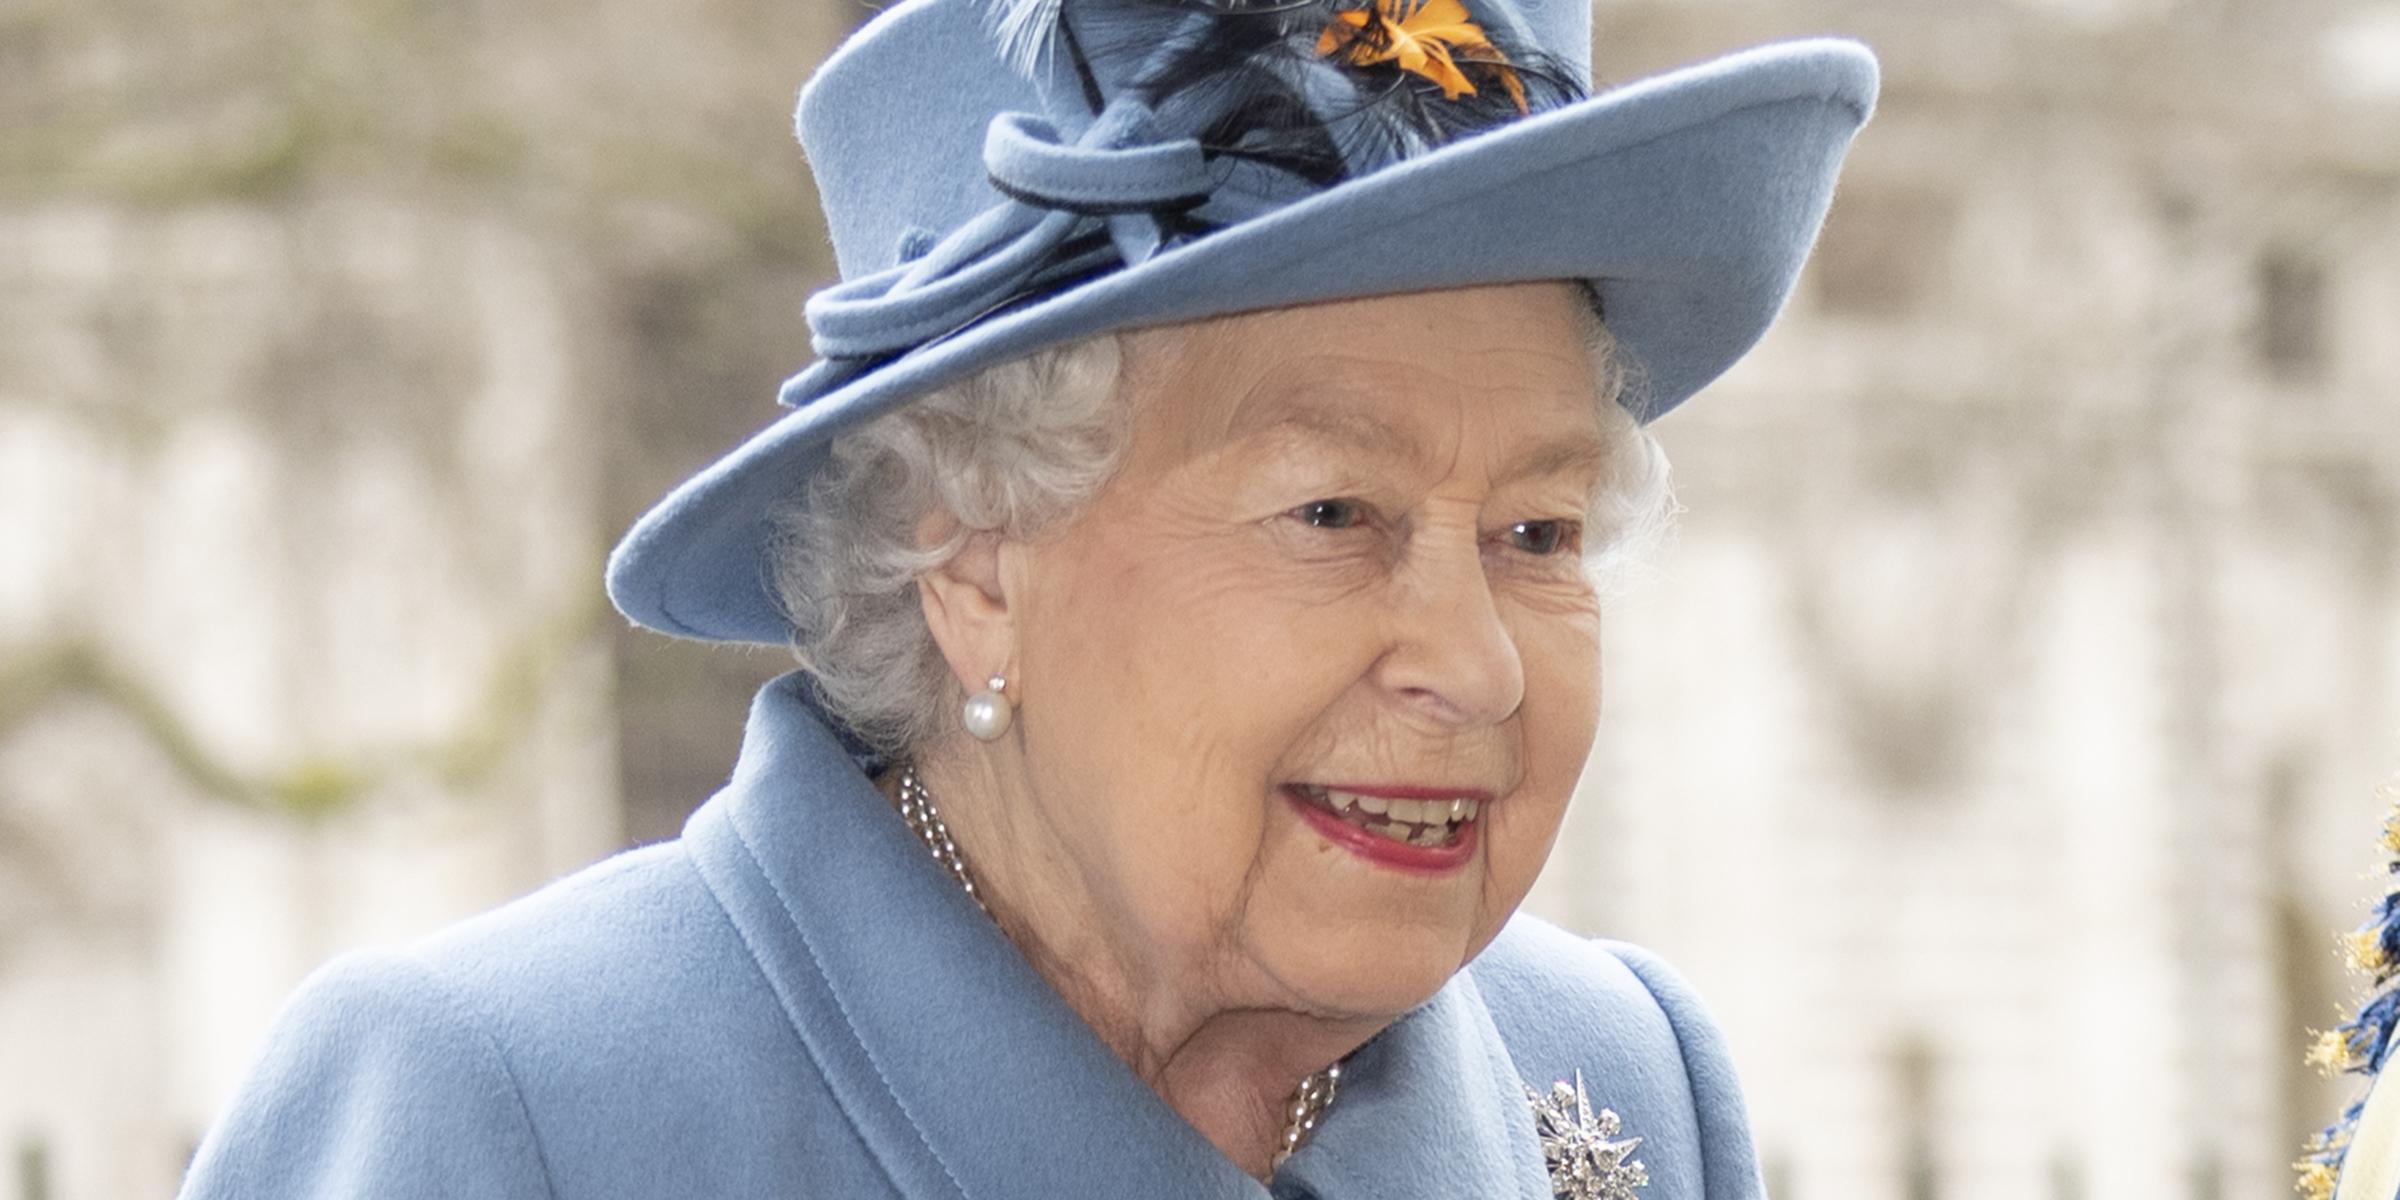 Queen Elizabeth Celebrates Her 92nd Birthday at Trooping